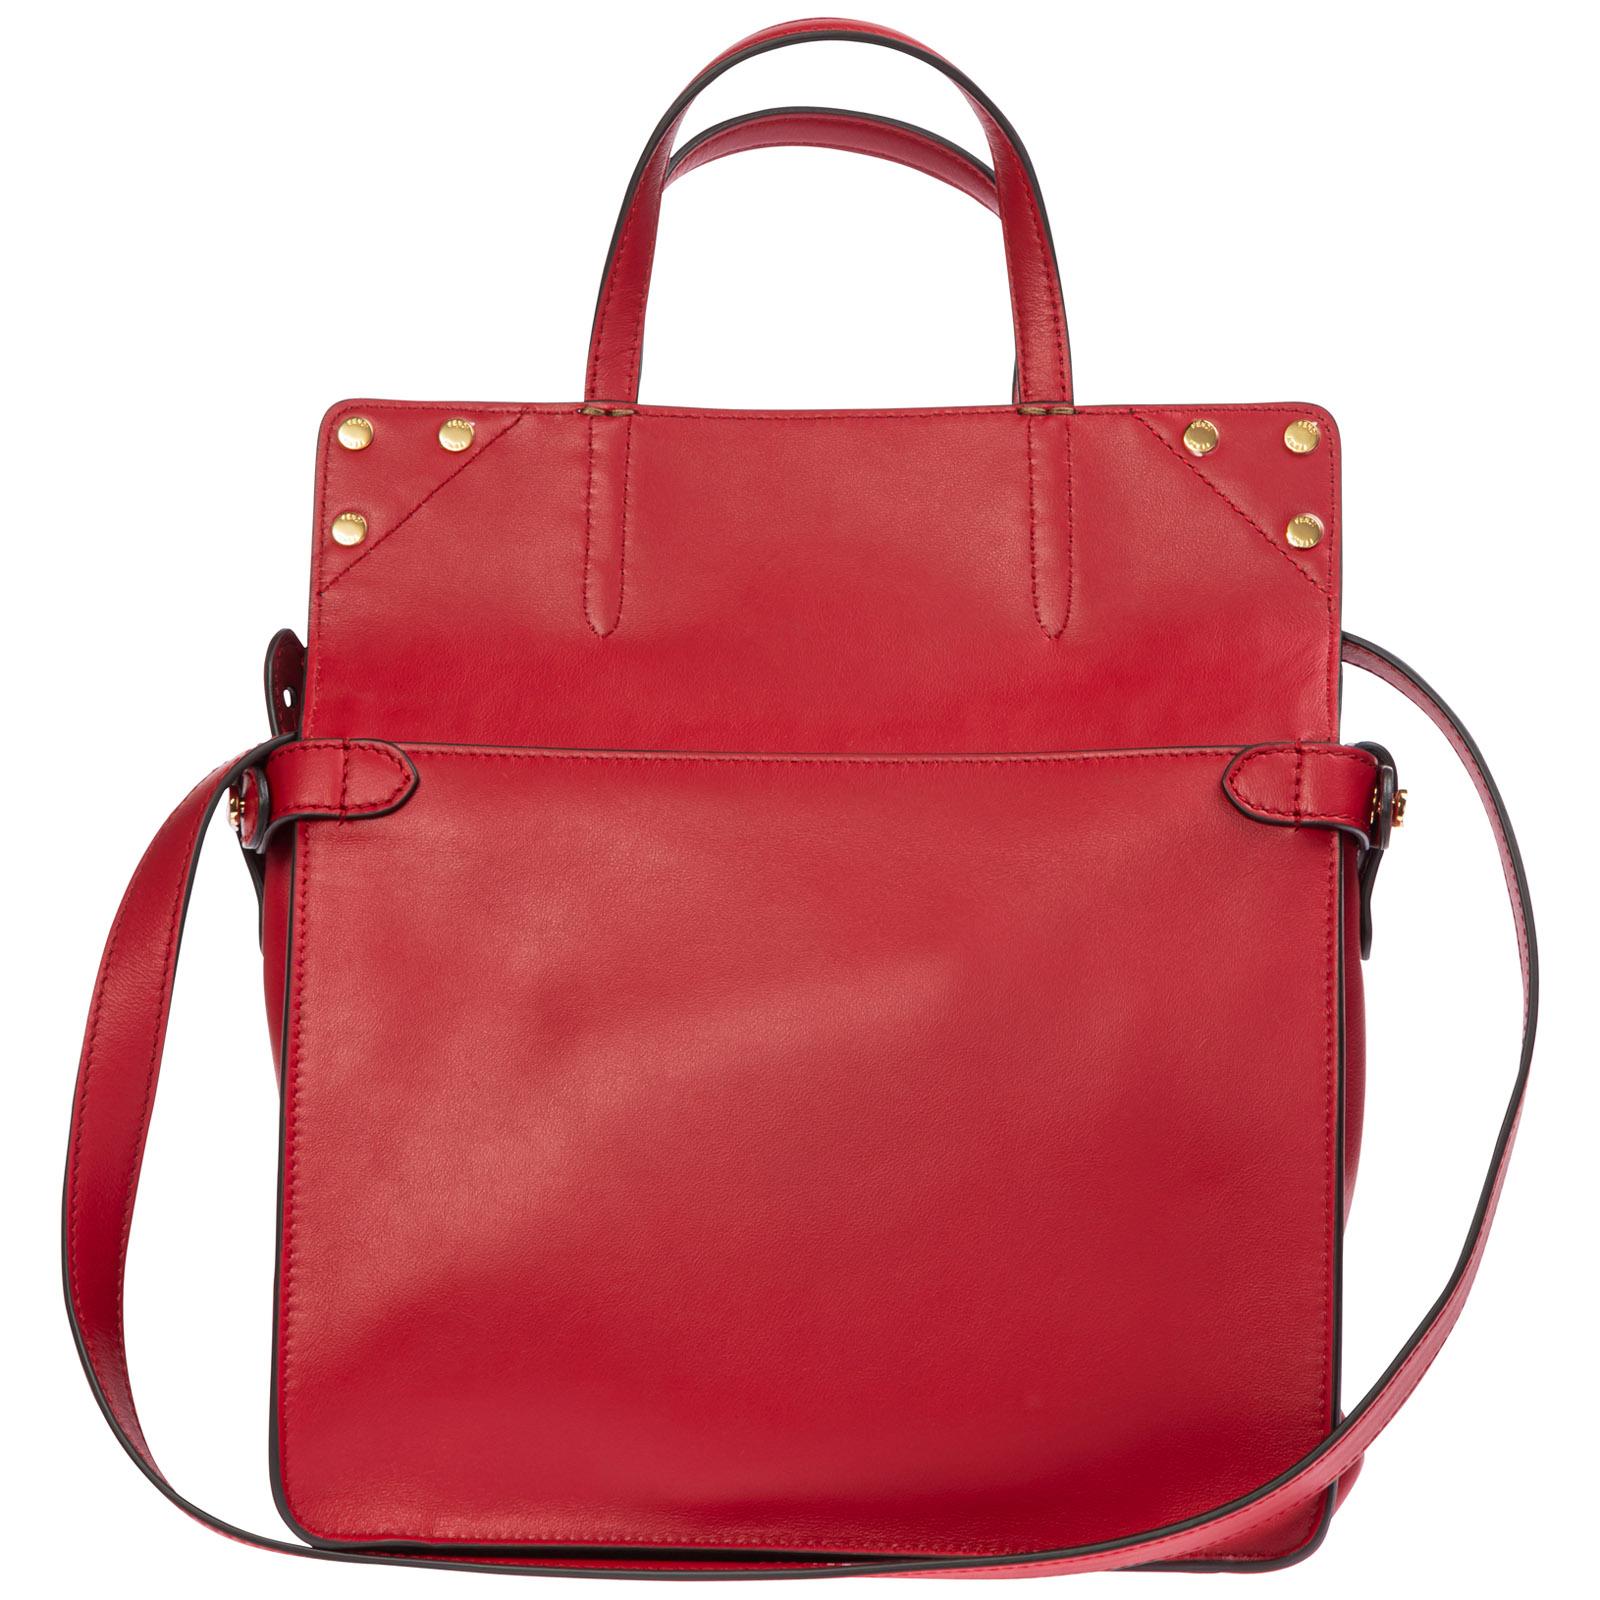 new authentic new arrive low price sale Women's leather handbag shopping bag purse flip